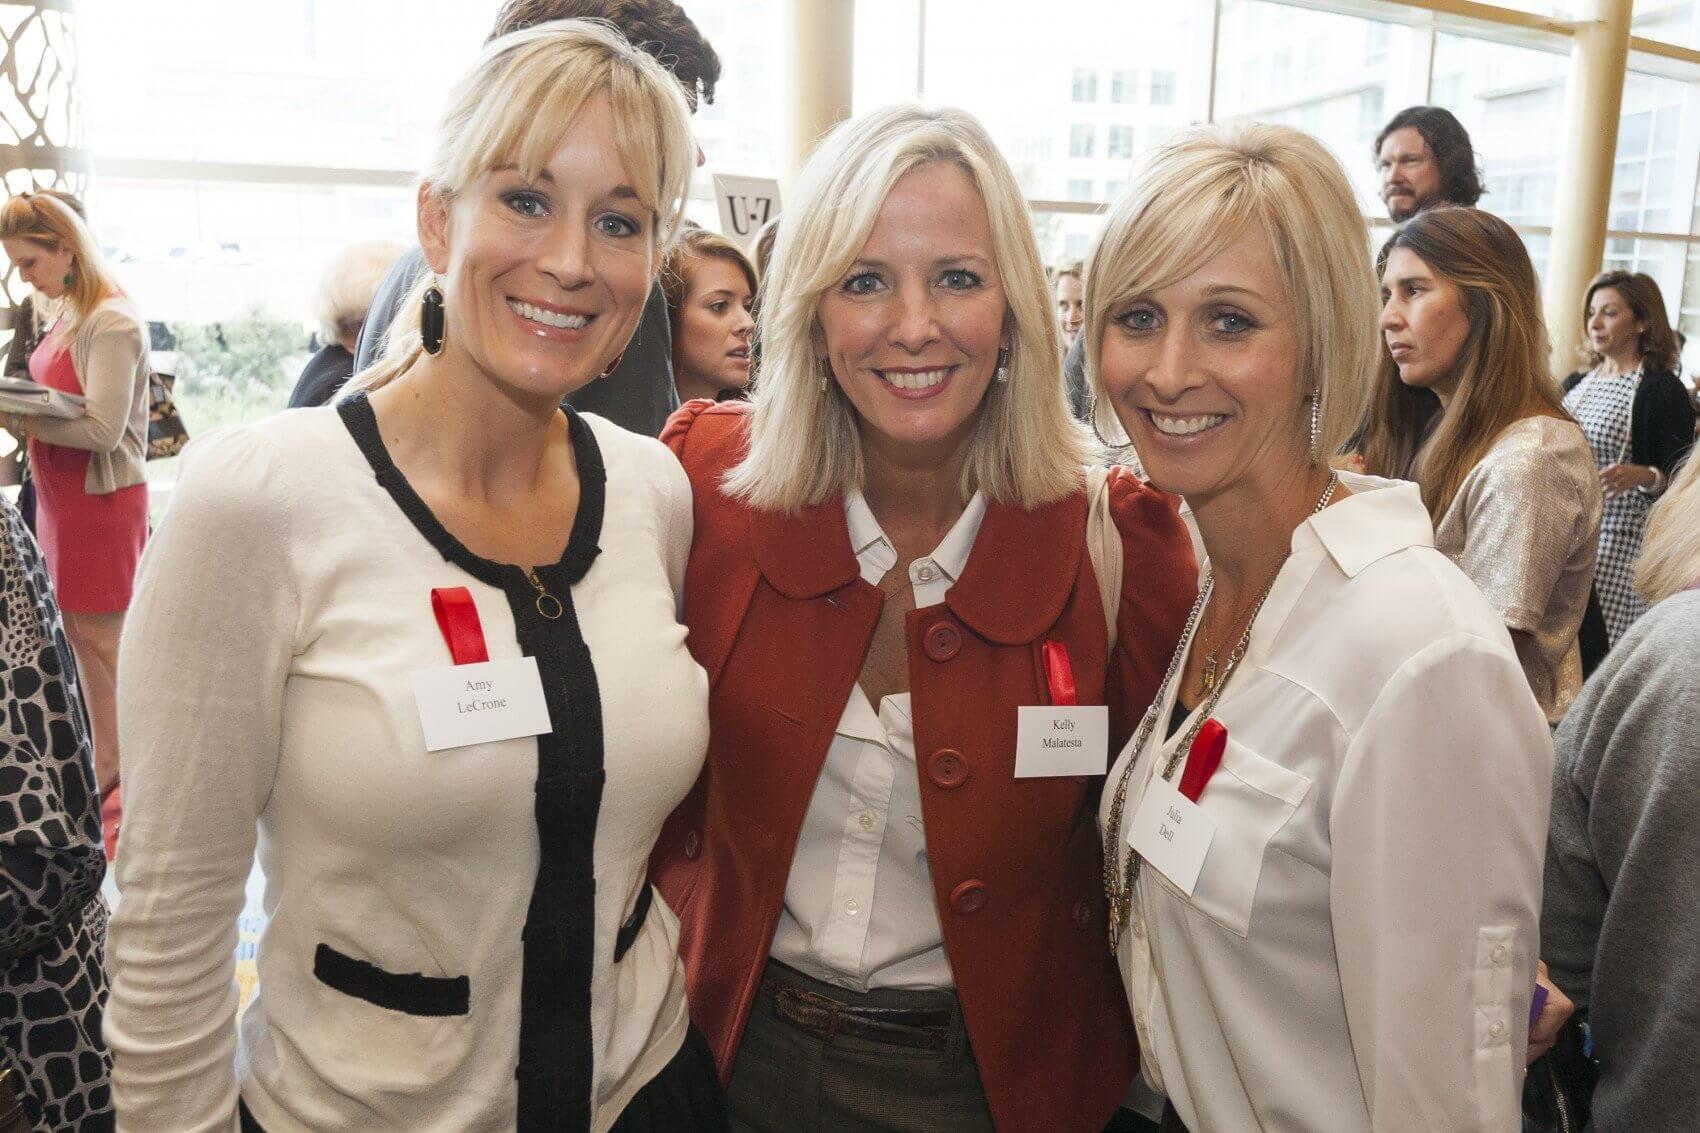 Amy LeCrone, Kelly Malatesta and Julia Dell (Credit: John Lewis Photography)